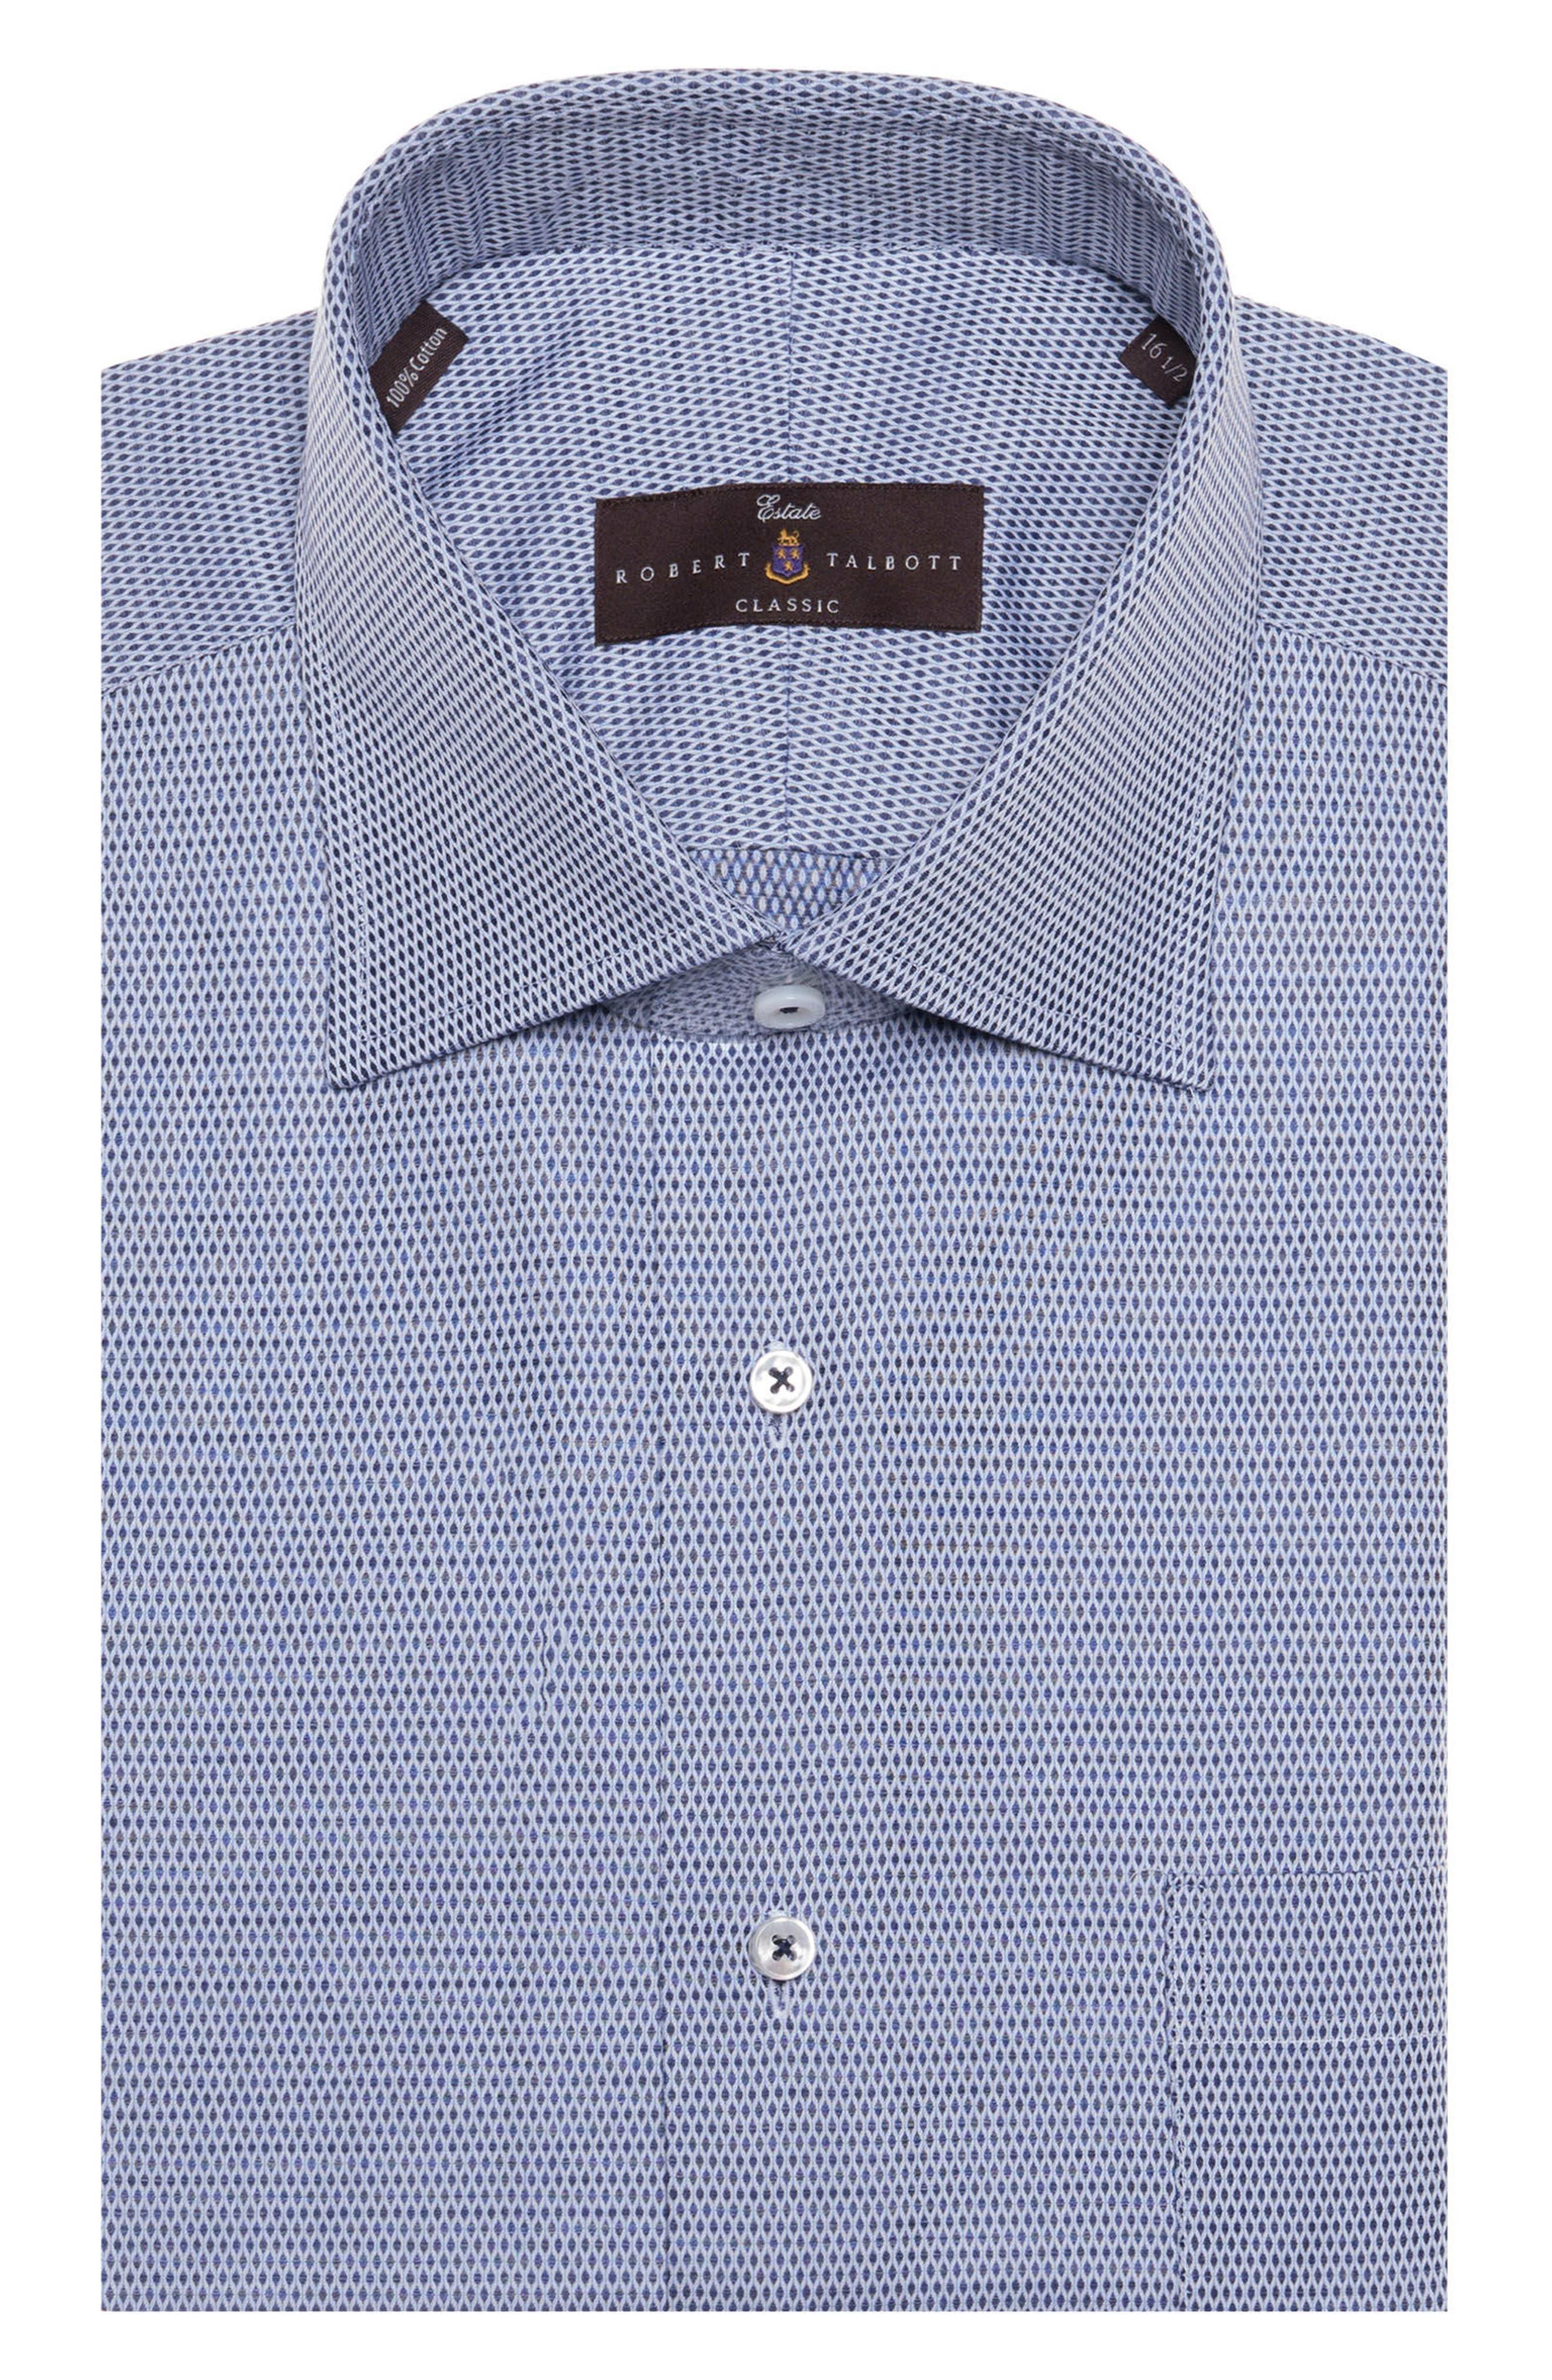 Main Image - Robert Talbott Tailored Fit Geometric Dress Shirt